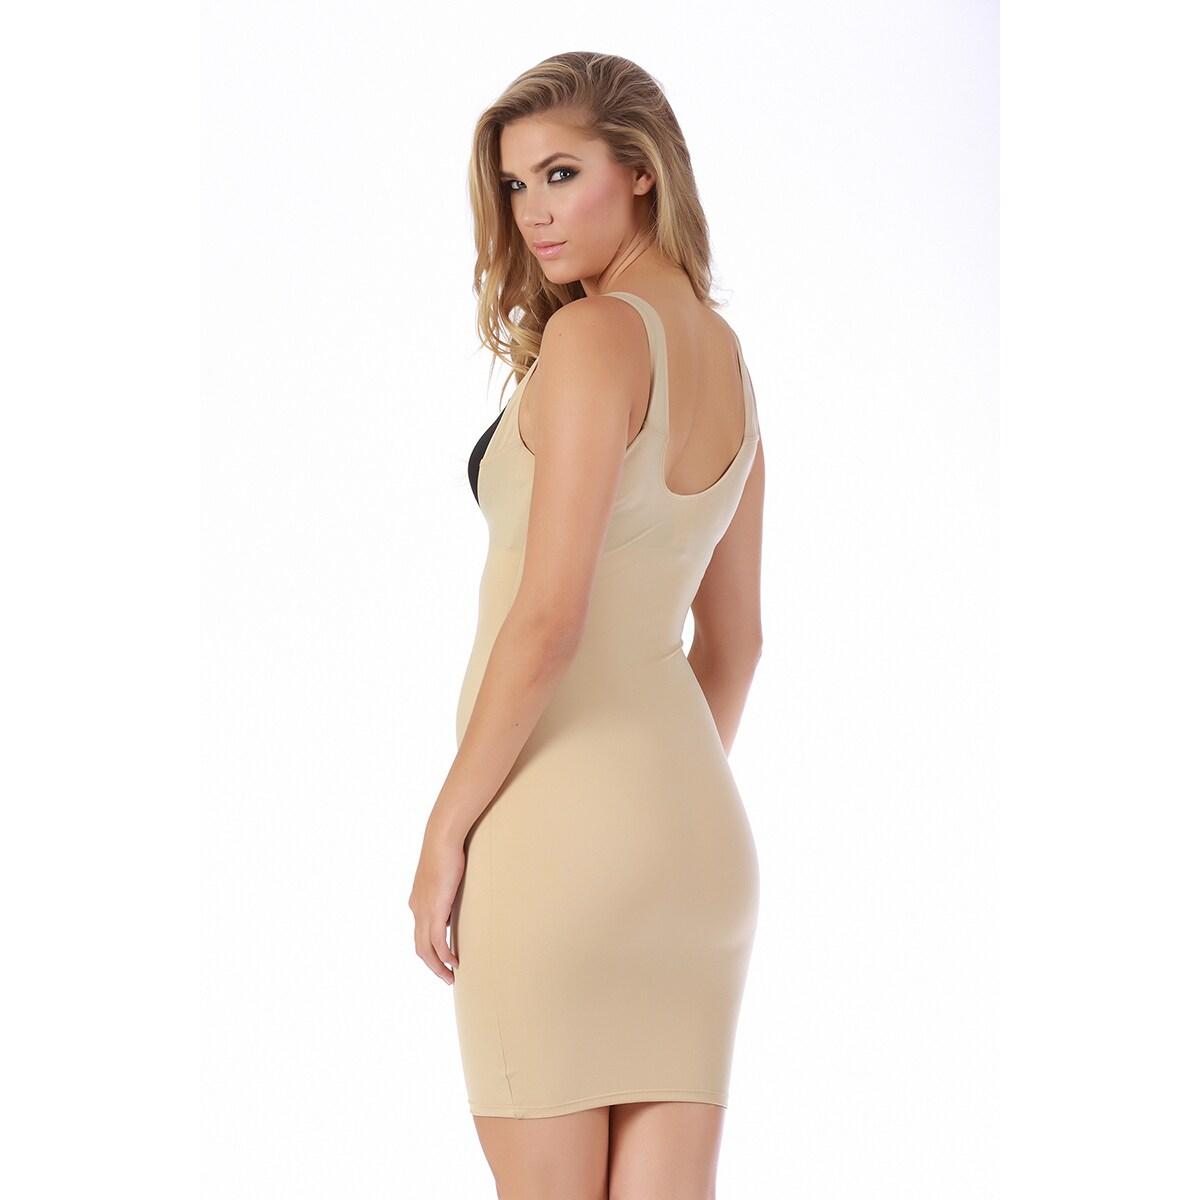 8b710a247 Shop InstantFigure Women s Underbust Slip Dress Shapewear - Free Shipping  Today - Overstock - 8361259